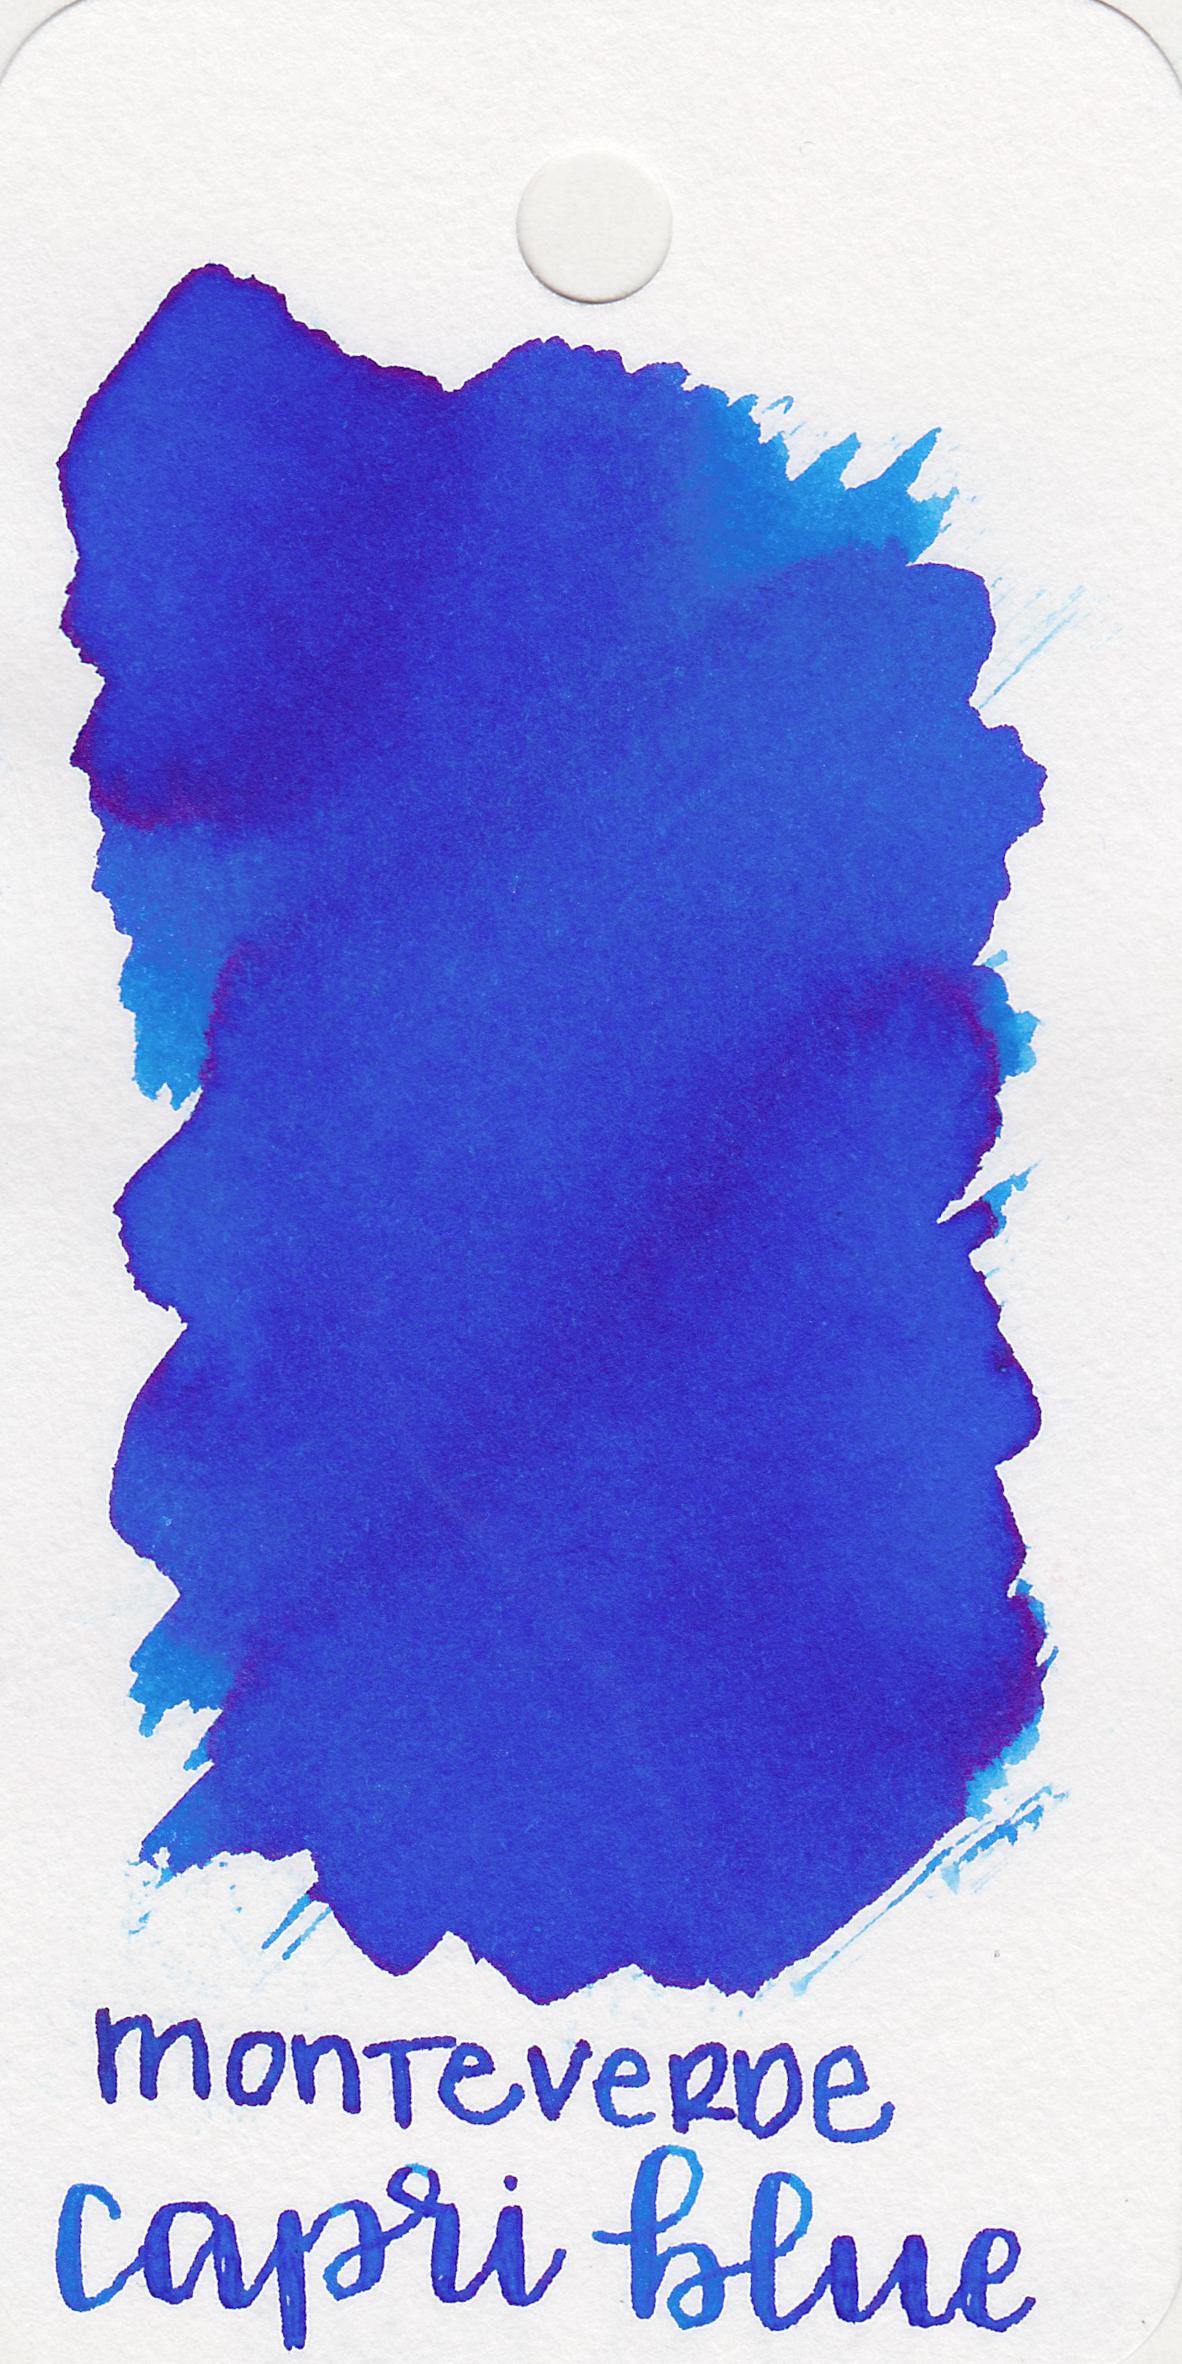 mv-capri-blue-1.jpg